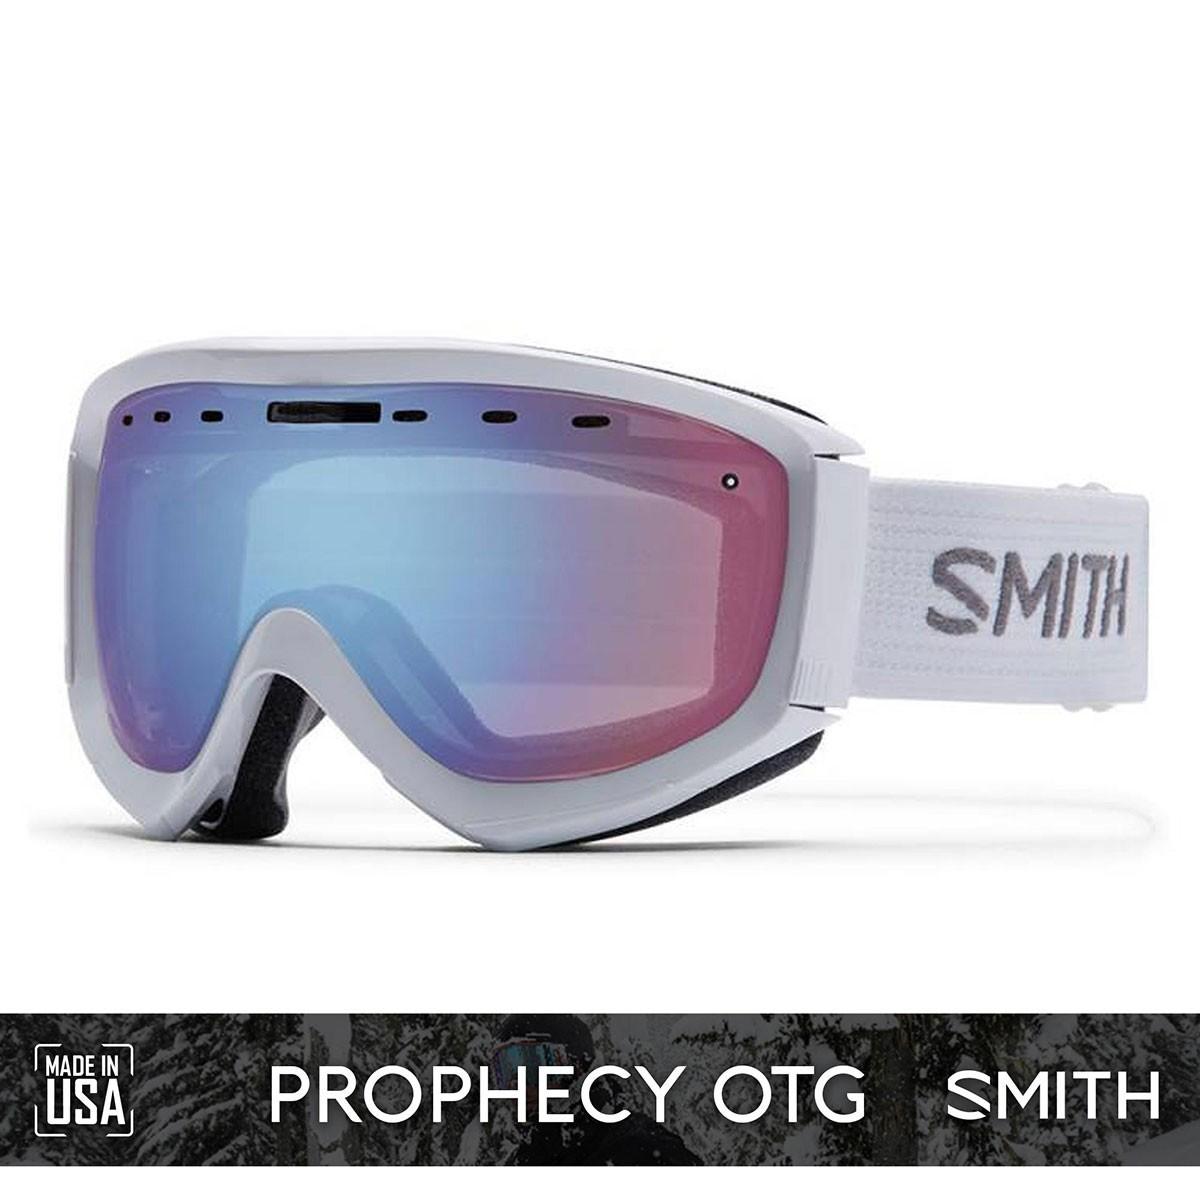 SMITH PROPHECY OTG White | S2 BLUE Sensor Mirror - Изображение - AQUAMATRIX